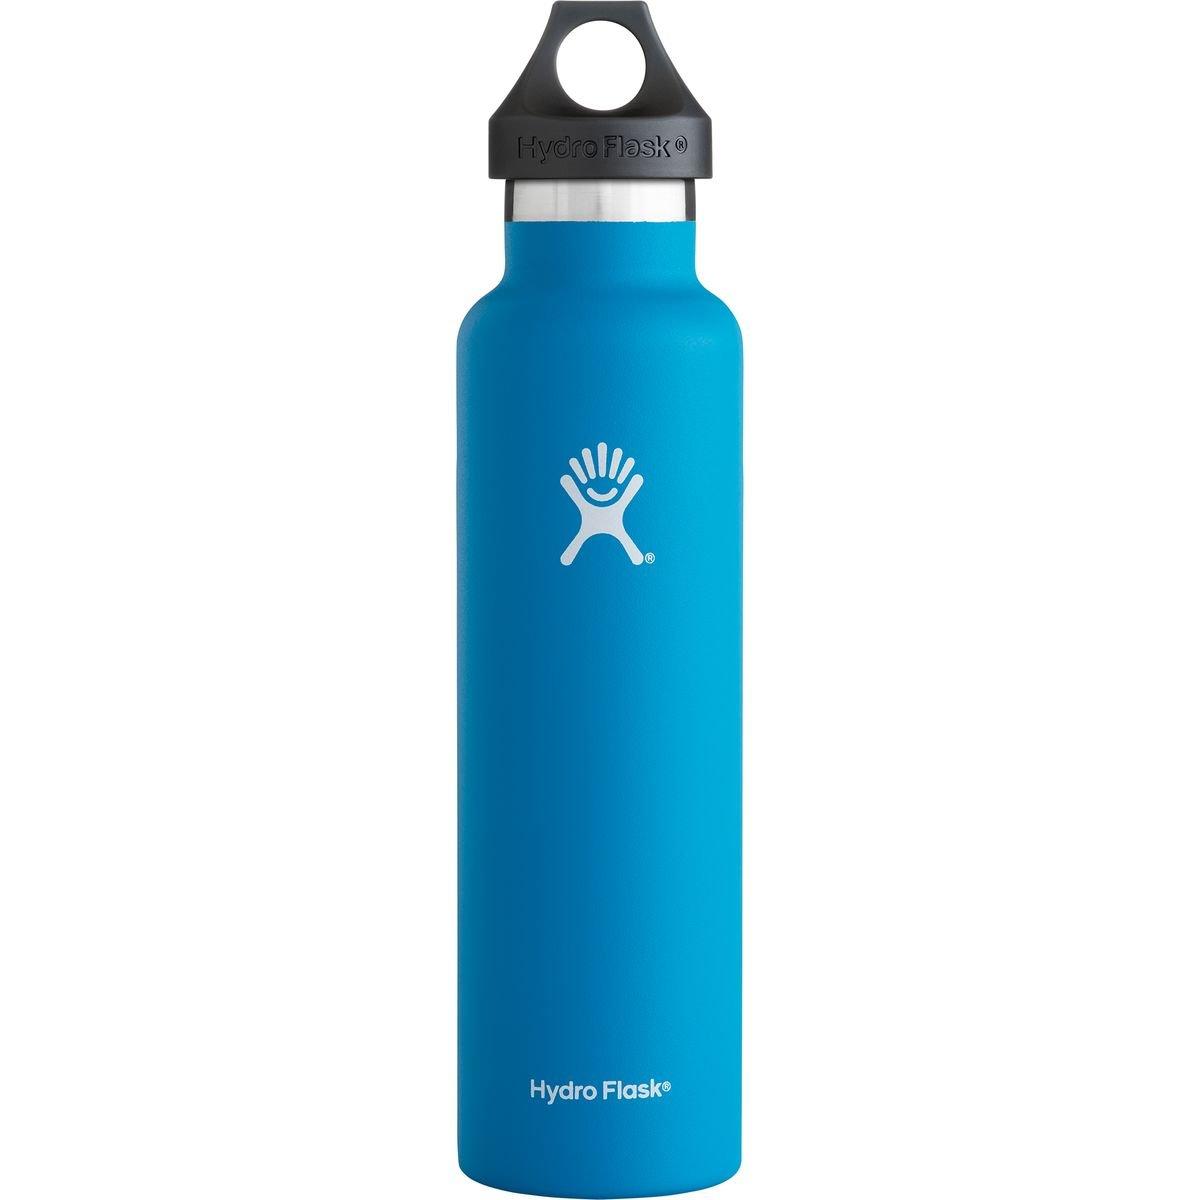 Hydro Flask Unisex 24 oz B01KXHF34W Thermosflaschen